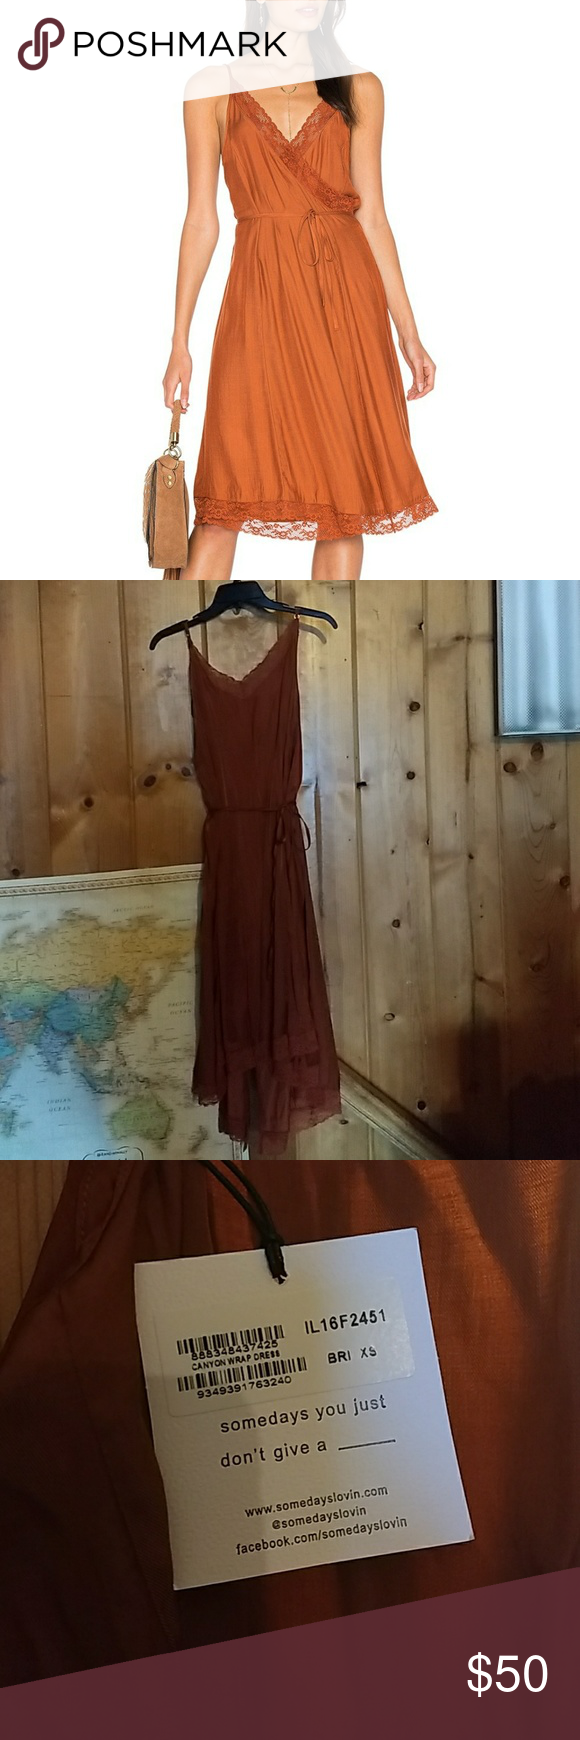 Canyon Wrap Dress Brick colored satin wrap dress with lace